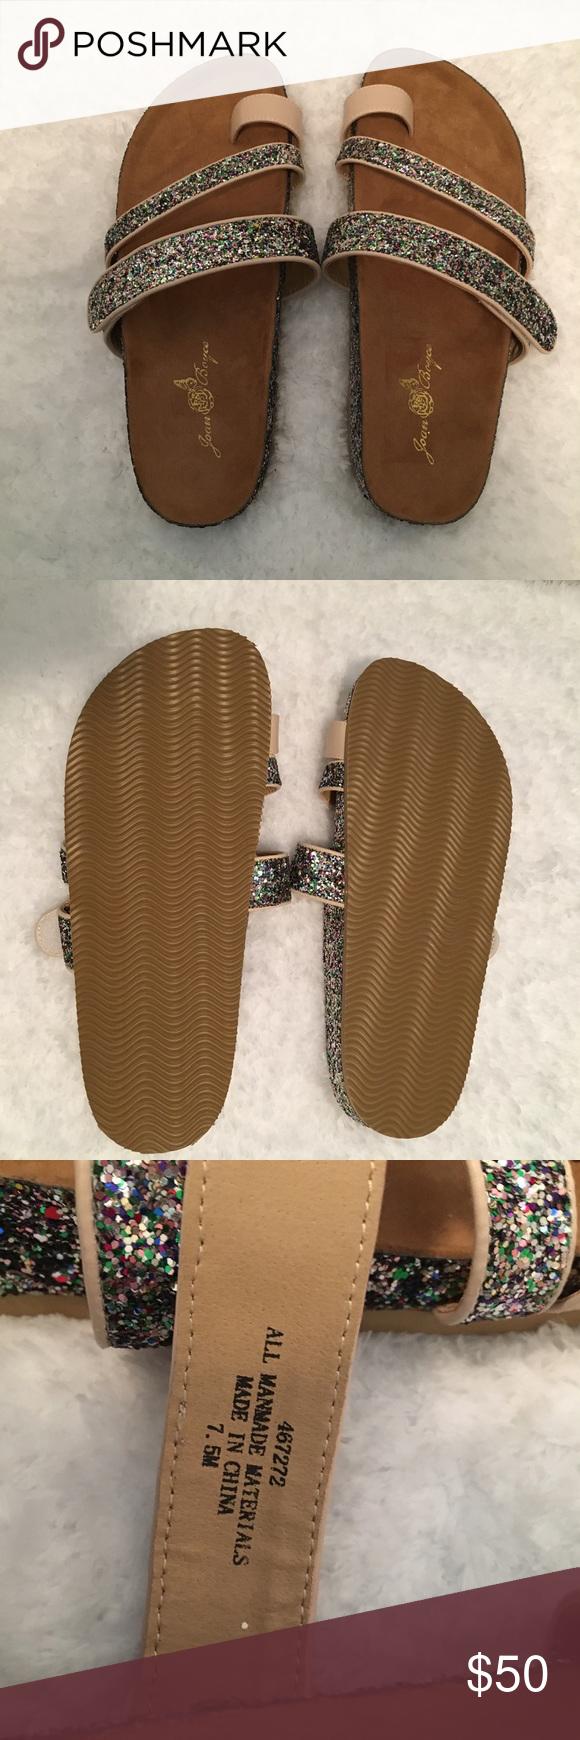 Comfortable sandals, Glitter sandals